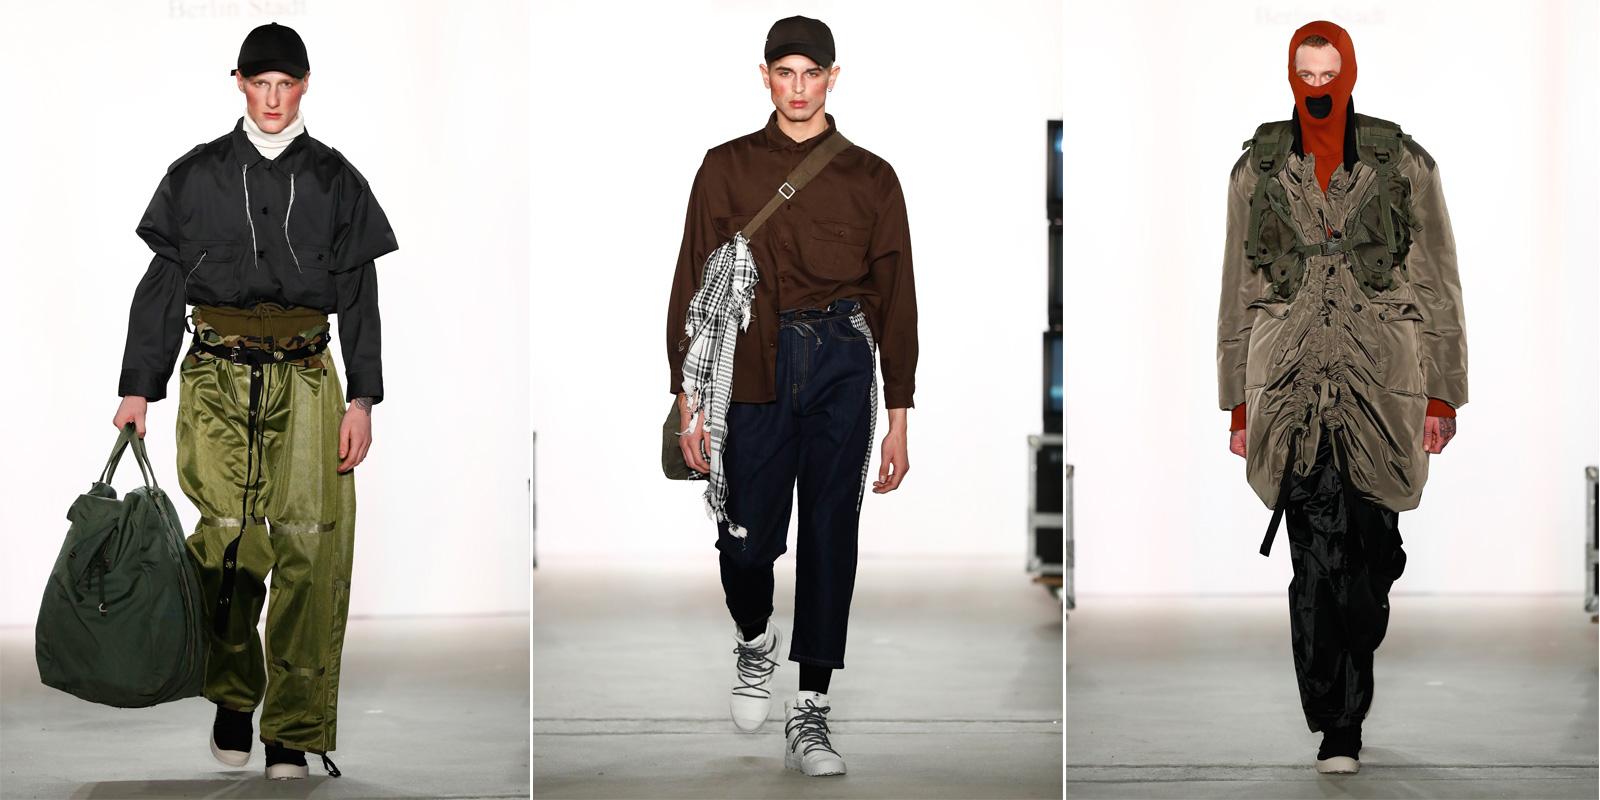 MBFWB-FW2017-Malefashion-Trends-Runway-Berlin-Fashionweek-Atelier-About